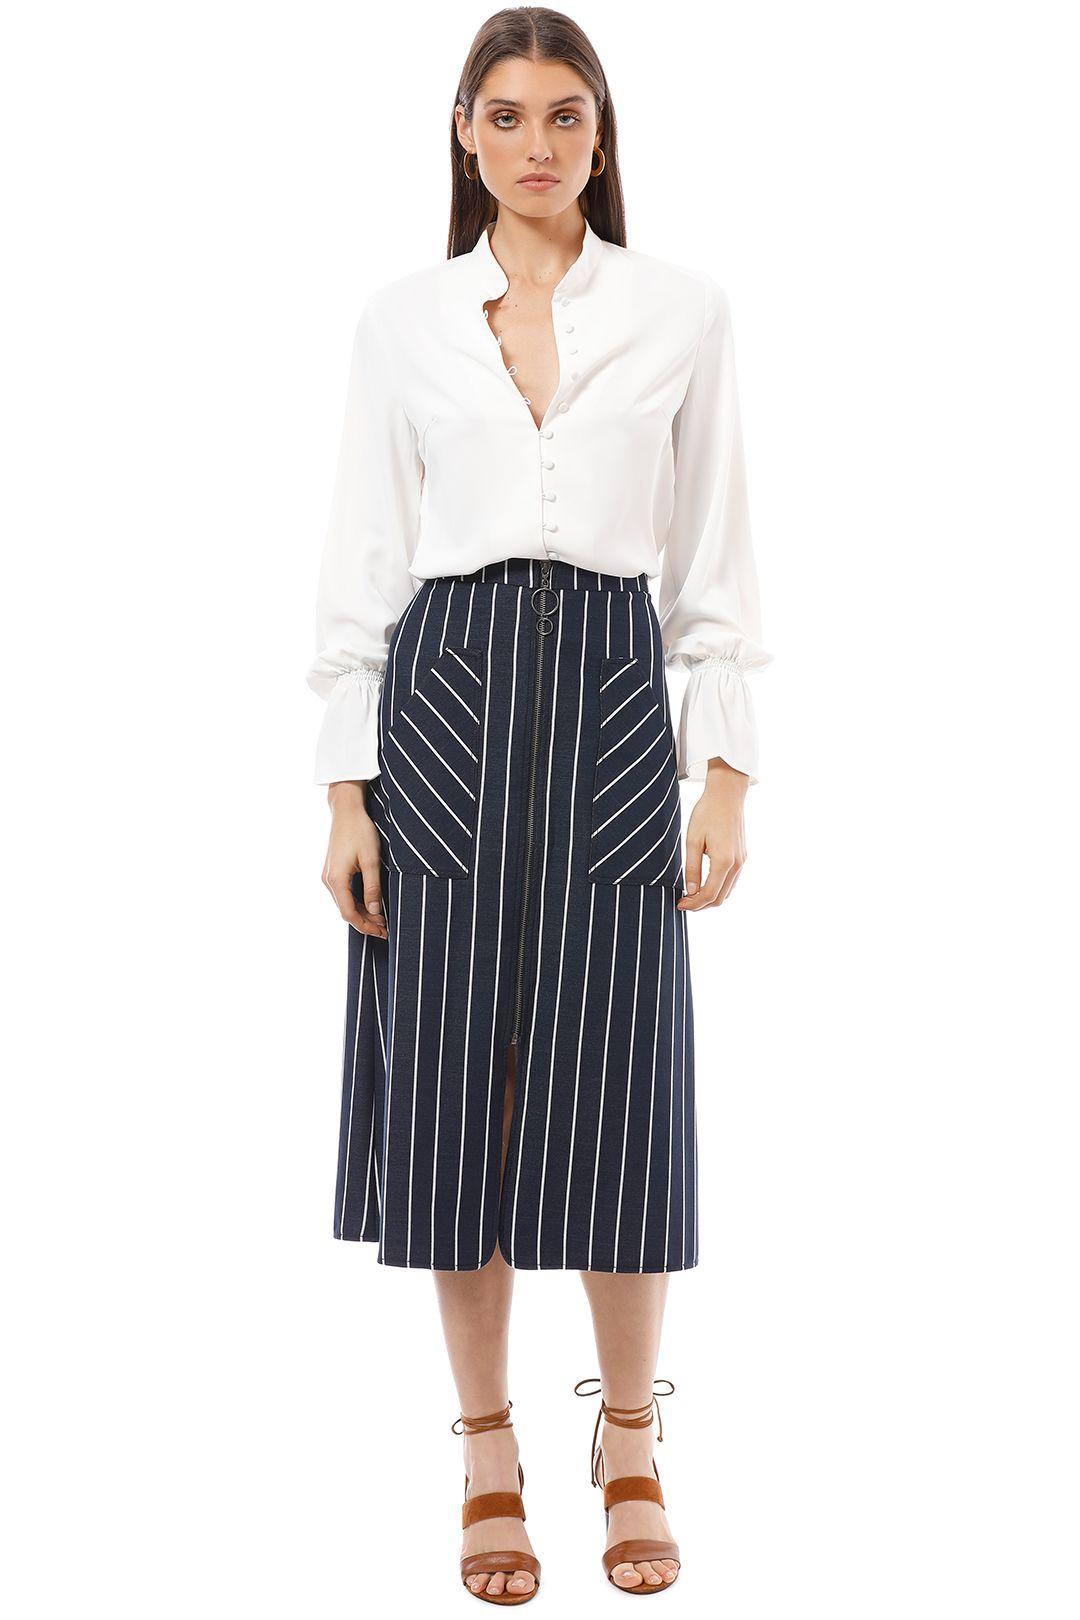 Veronika Maine - Textured Stripe Zip Skirt - Navy - Front